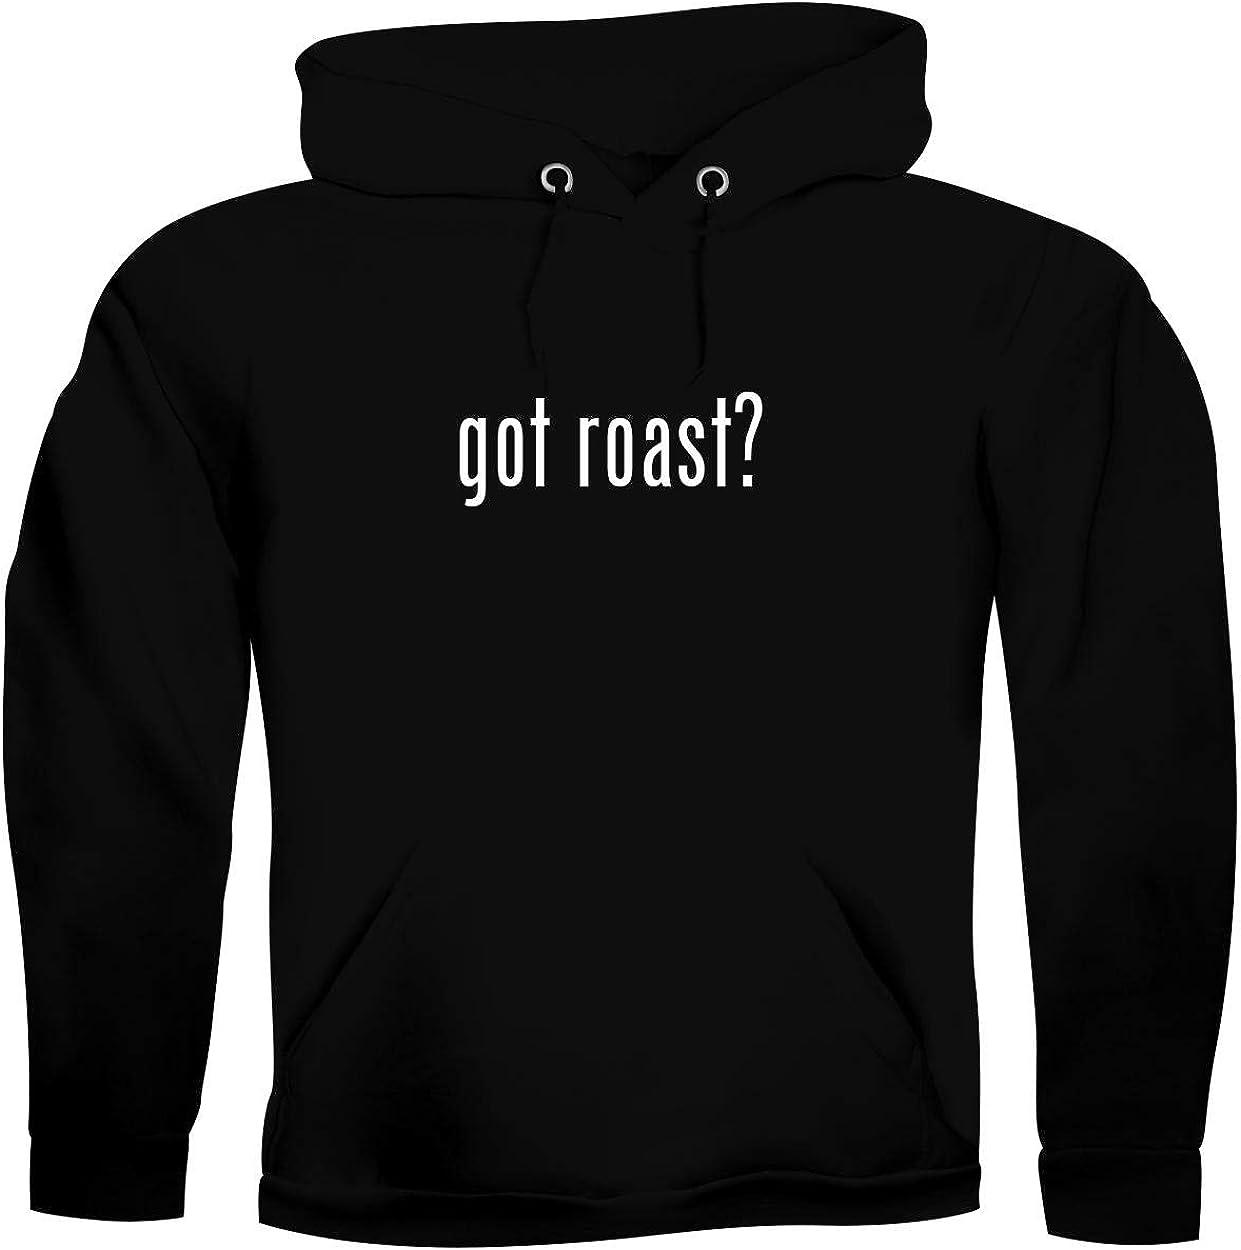 got roast? - Men's Ultra Soft Hoodie Sweatshirt